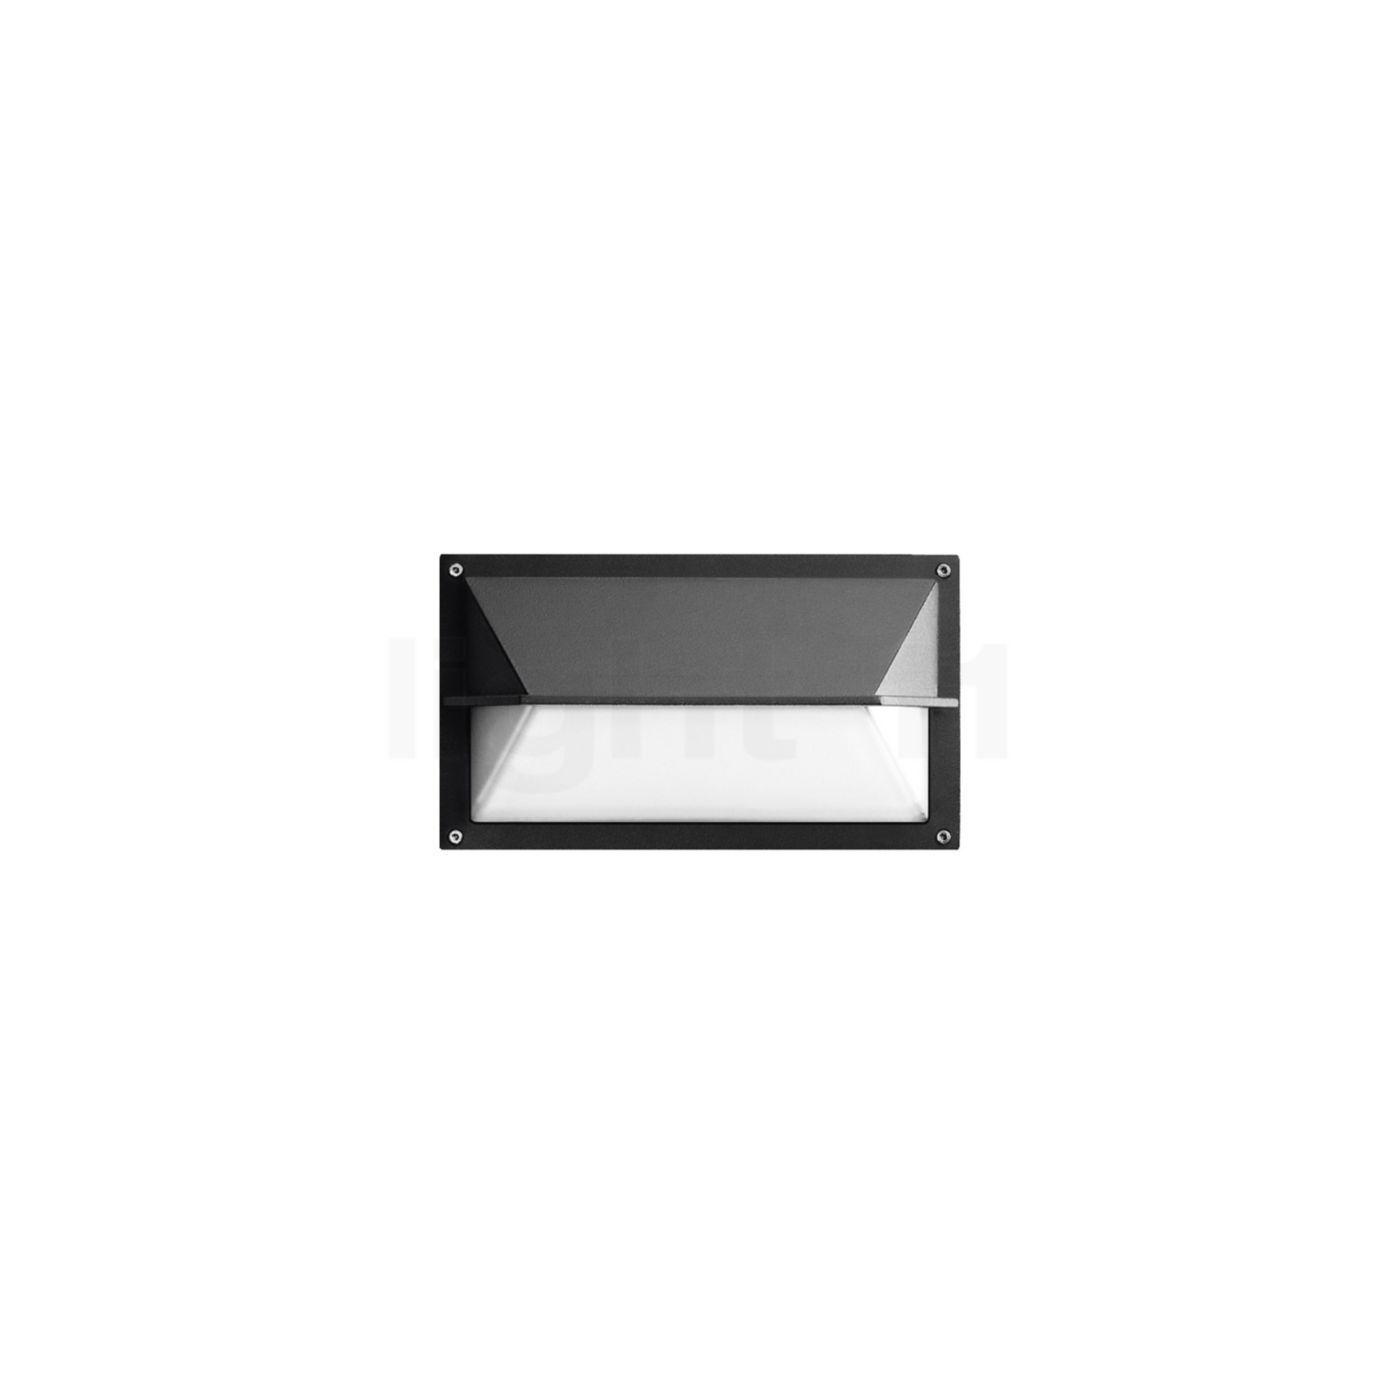 bega 22614 wandleuchte fluo kaufen bei. Black Bedroom Furniture Sets. Home Design Ideas